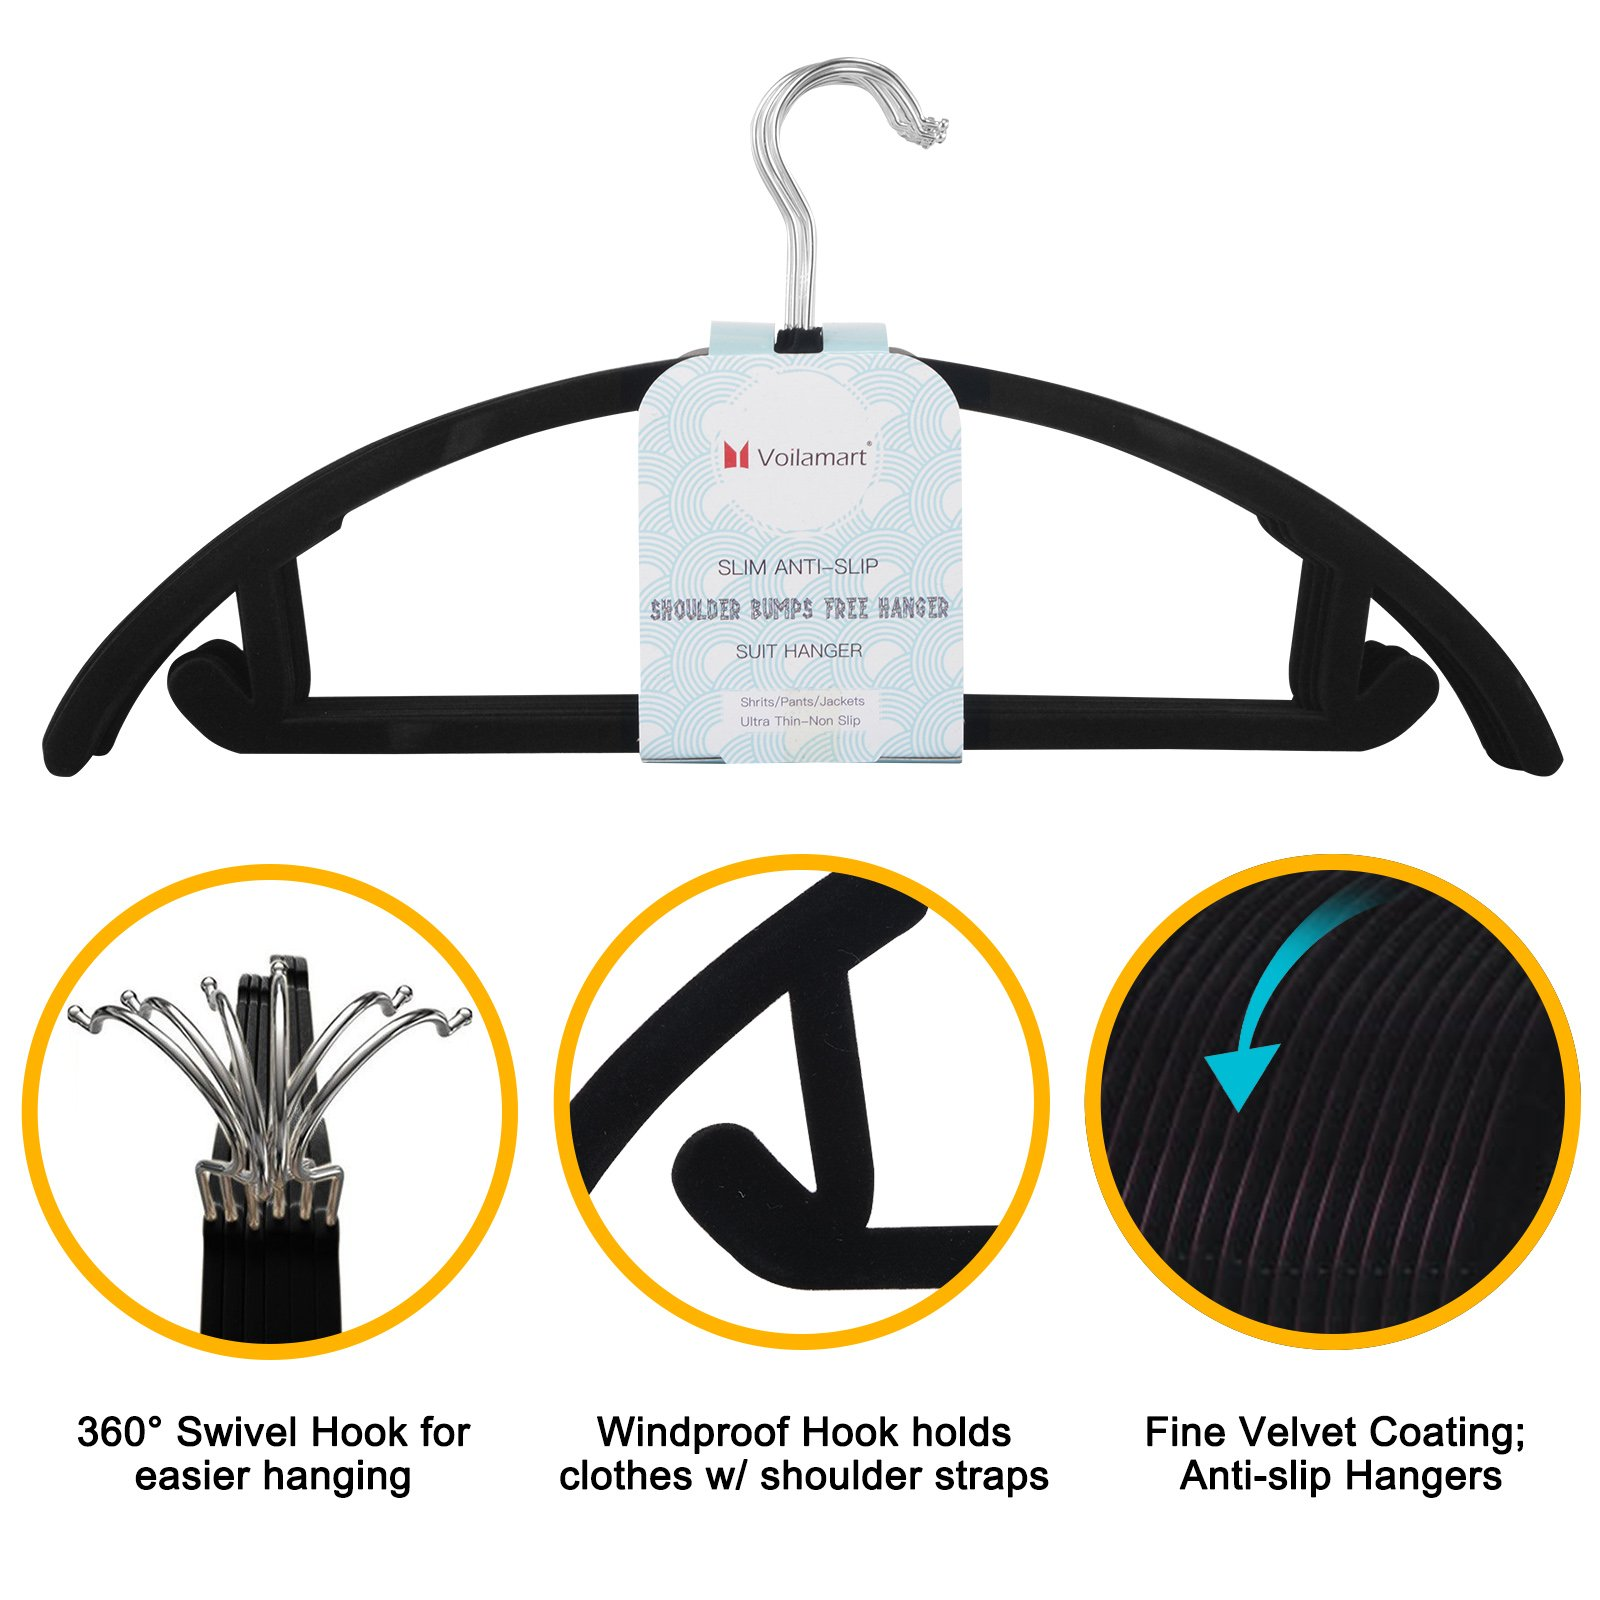 Voilamart Velvet Hangers Pack of 50 No Shoulder Bumps Suit Hangers with Chrome Hooks, Non Slip Space Saving Clothes Hangers Heavy Duty Rounded Hangers for Sweaters, Coat, Pants, Shirts, Dresses